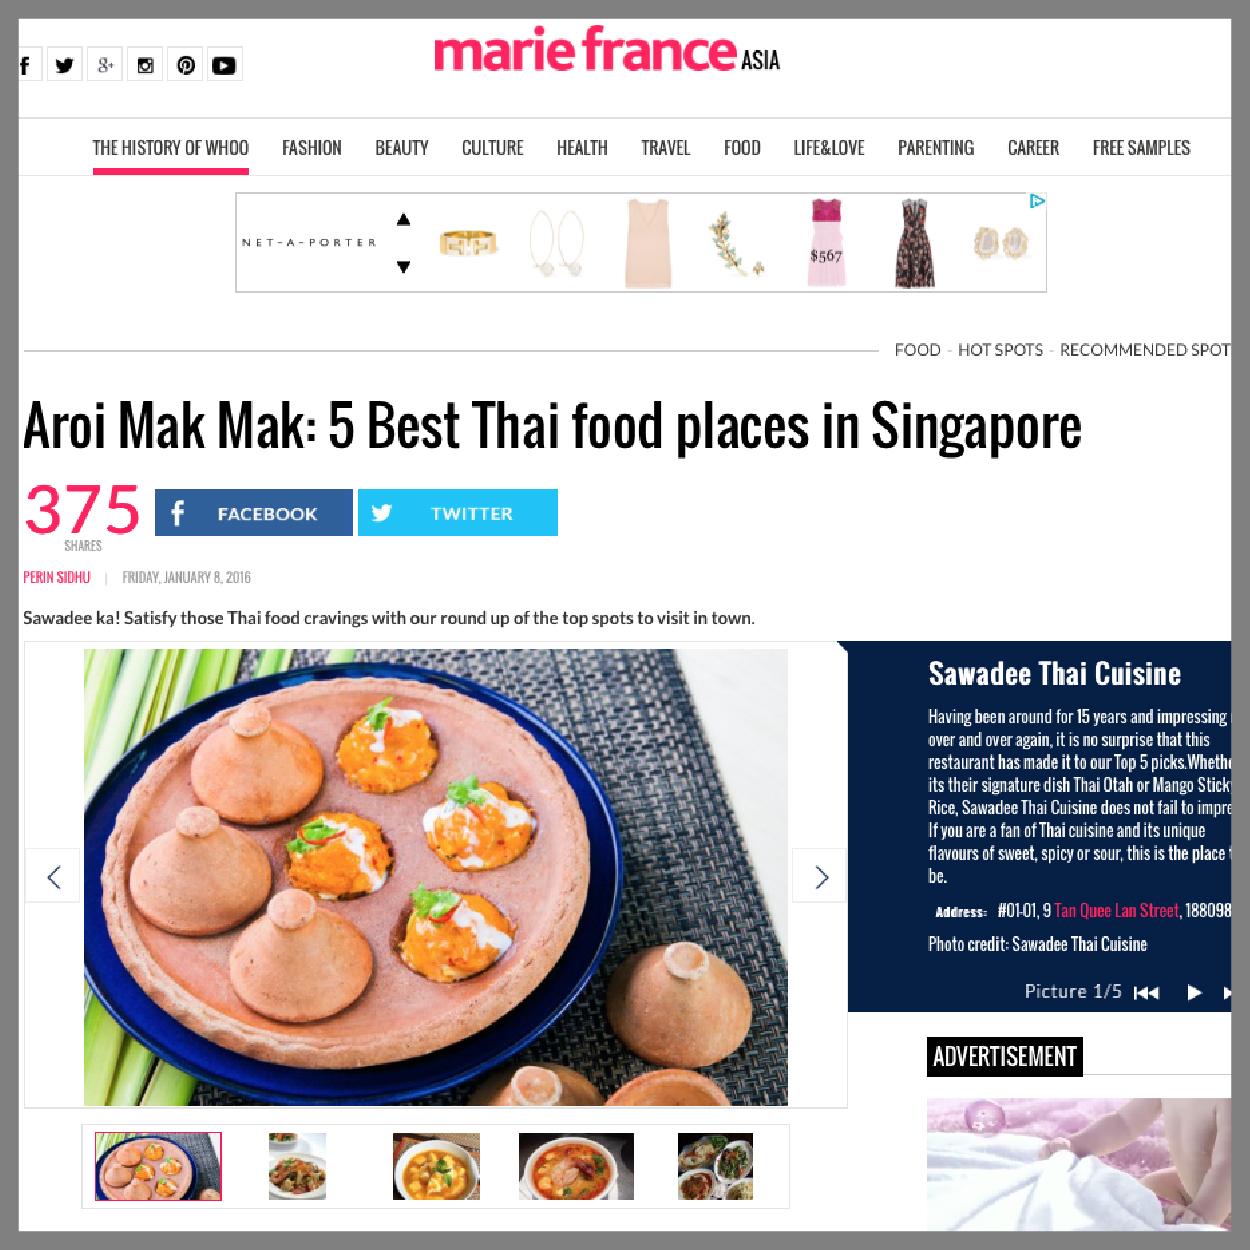 Marie France Asia, 8 Jan 2016